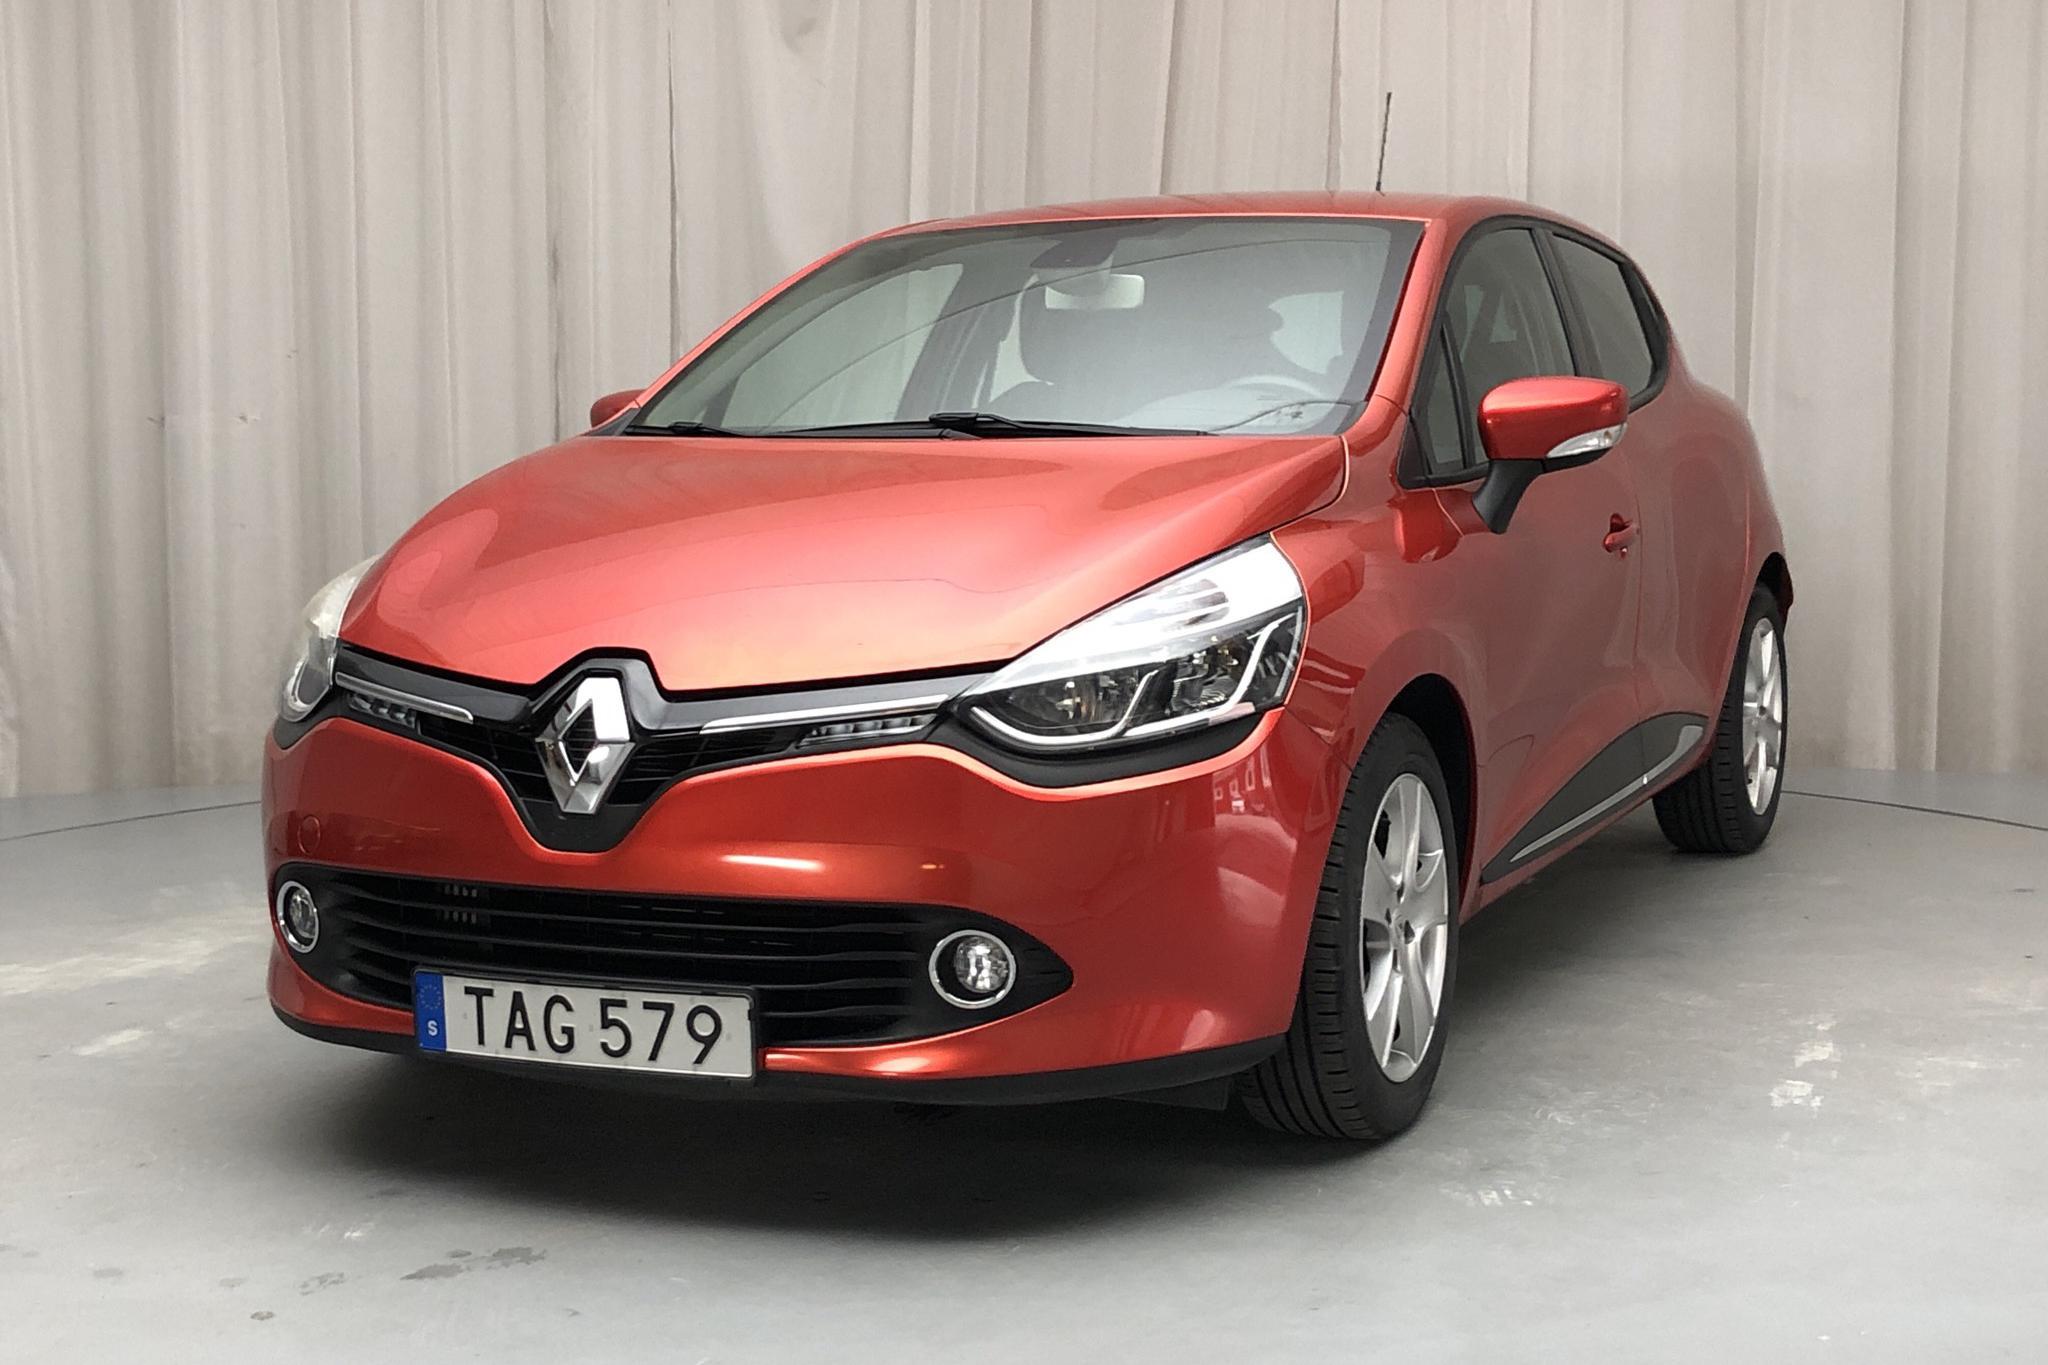 Renault Clio IV 0.9 TCe 90 5dr (90hk) - 3 128 mil - Manuell - röd - 2014